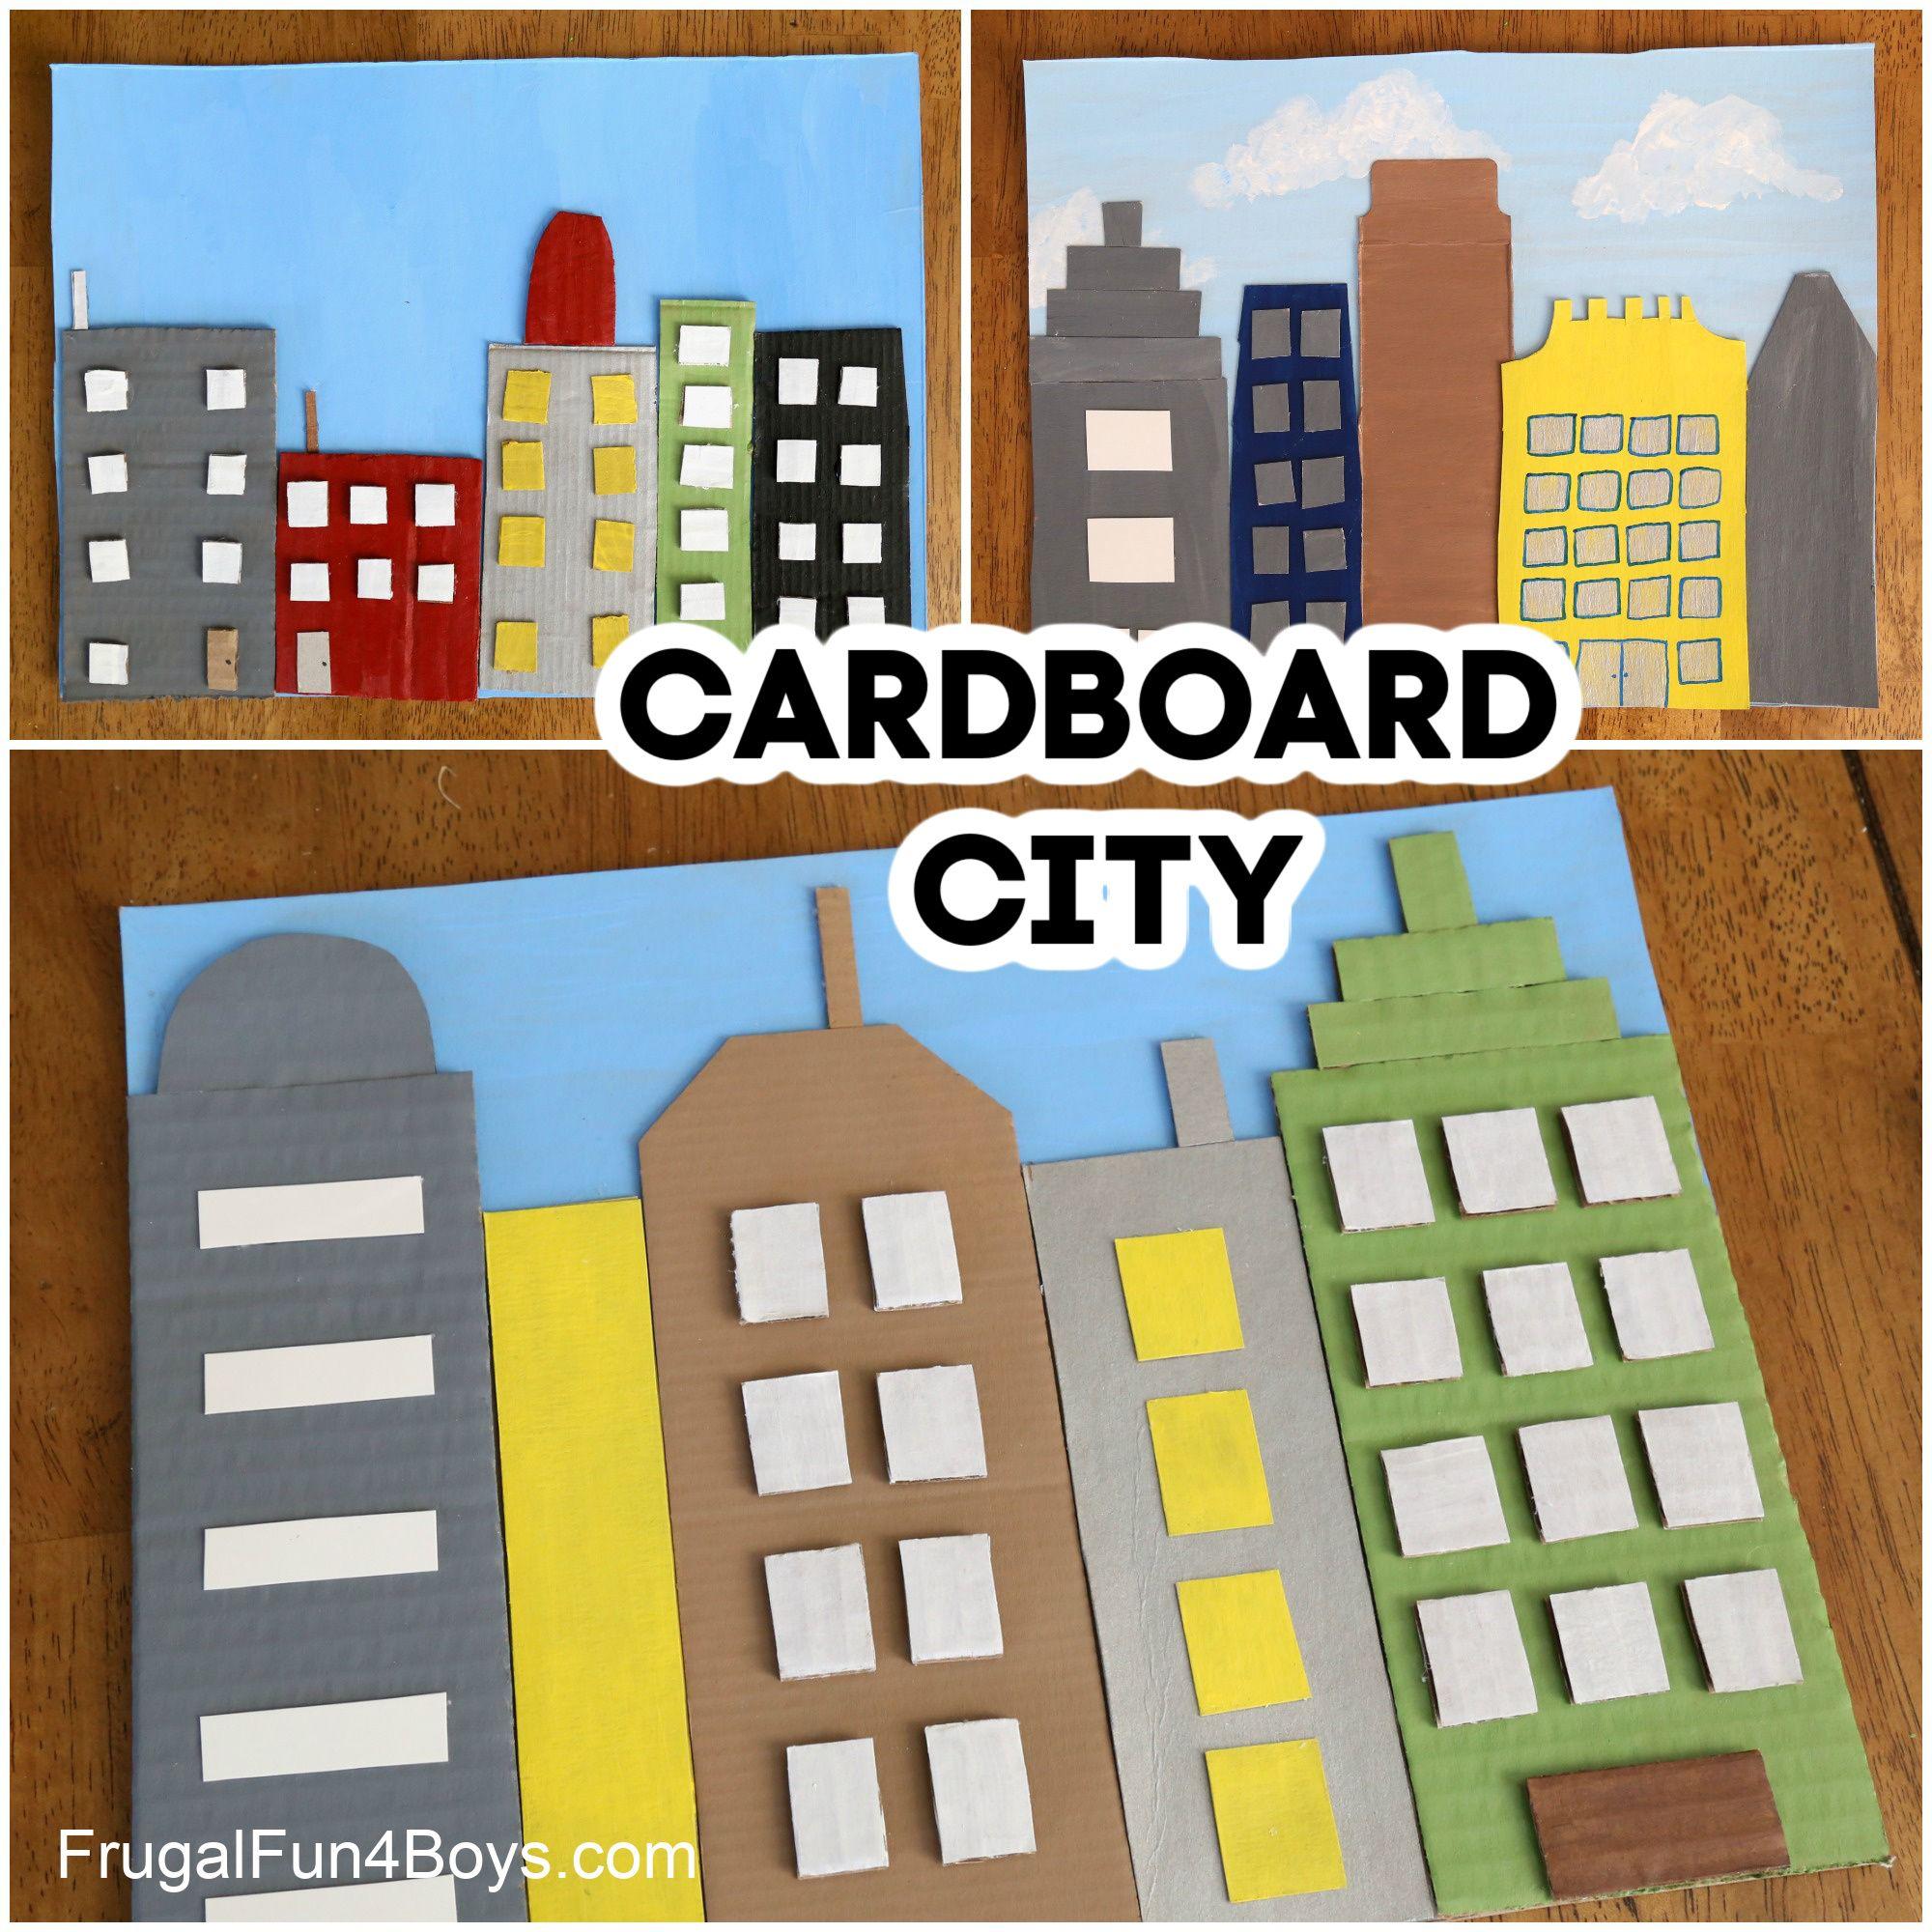 Cardboard City Skyline Collage